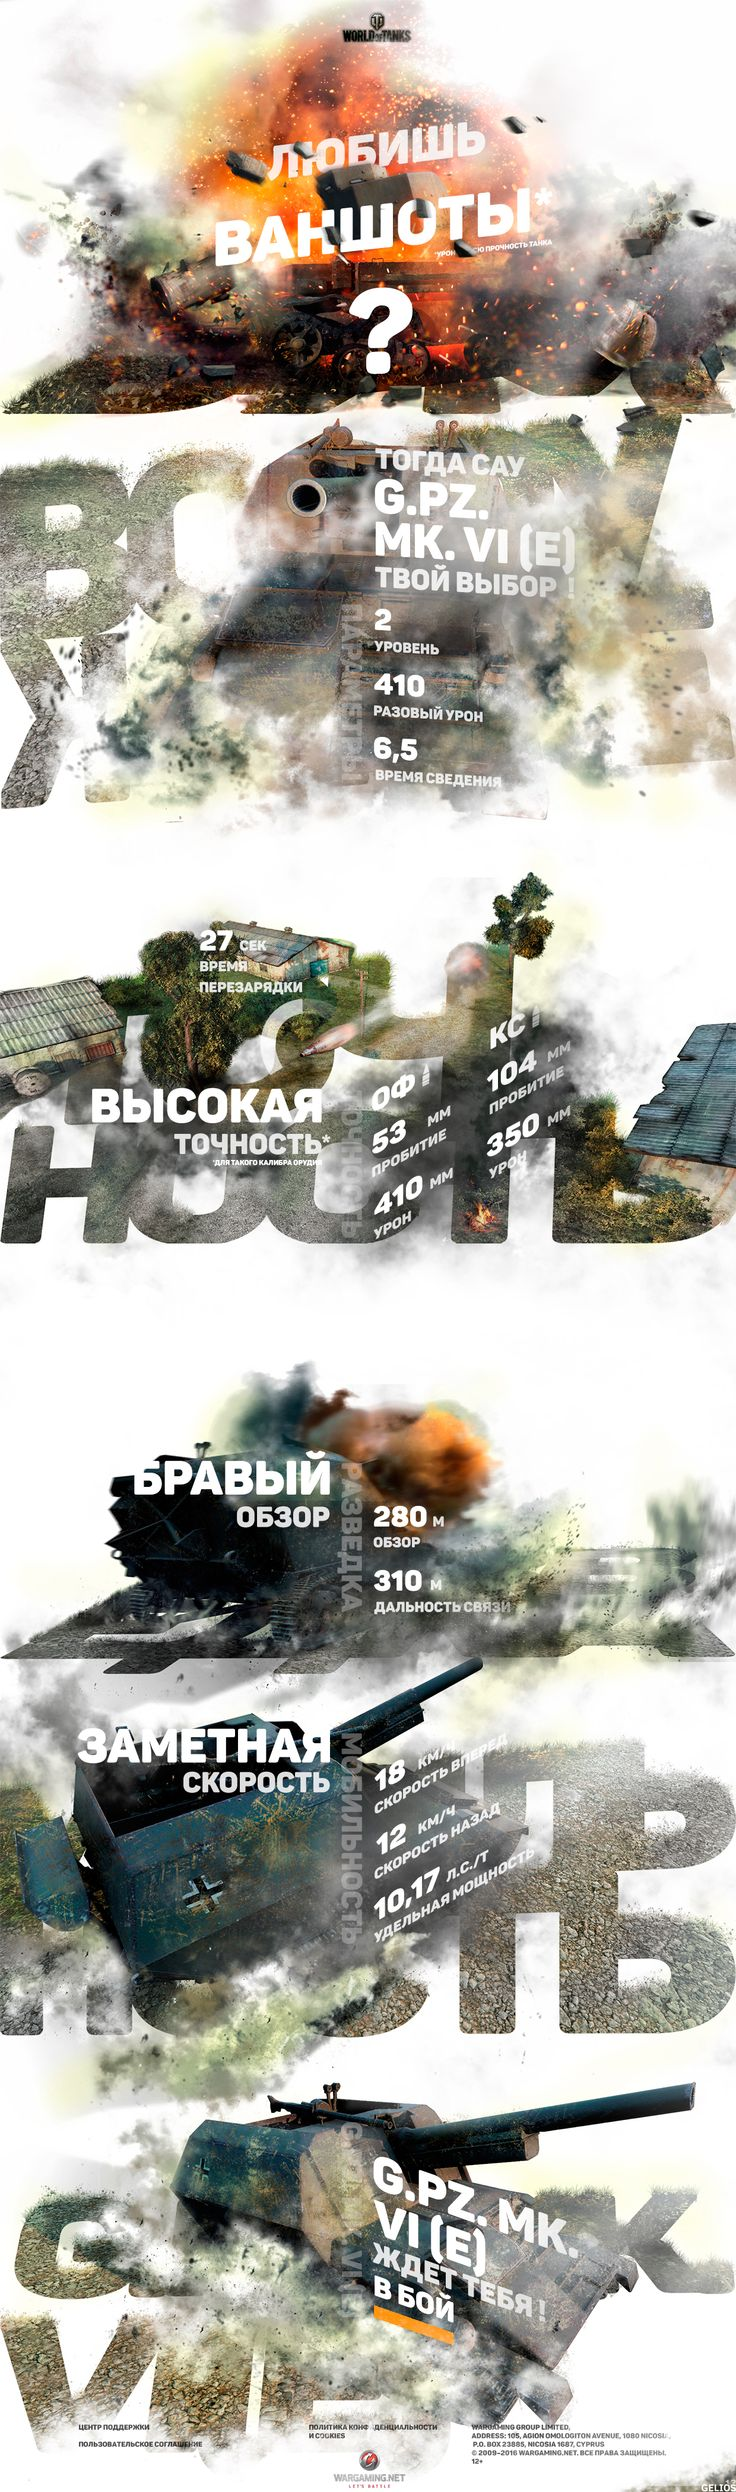 German artillery G.Pz. Mk. VI (e) site layout photoshop collage landing pages game